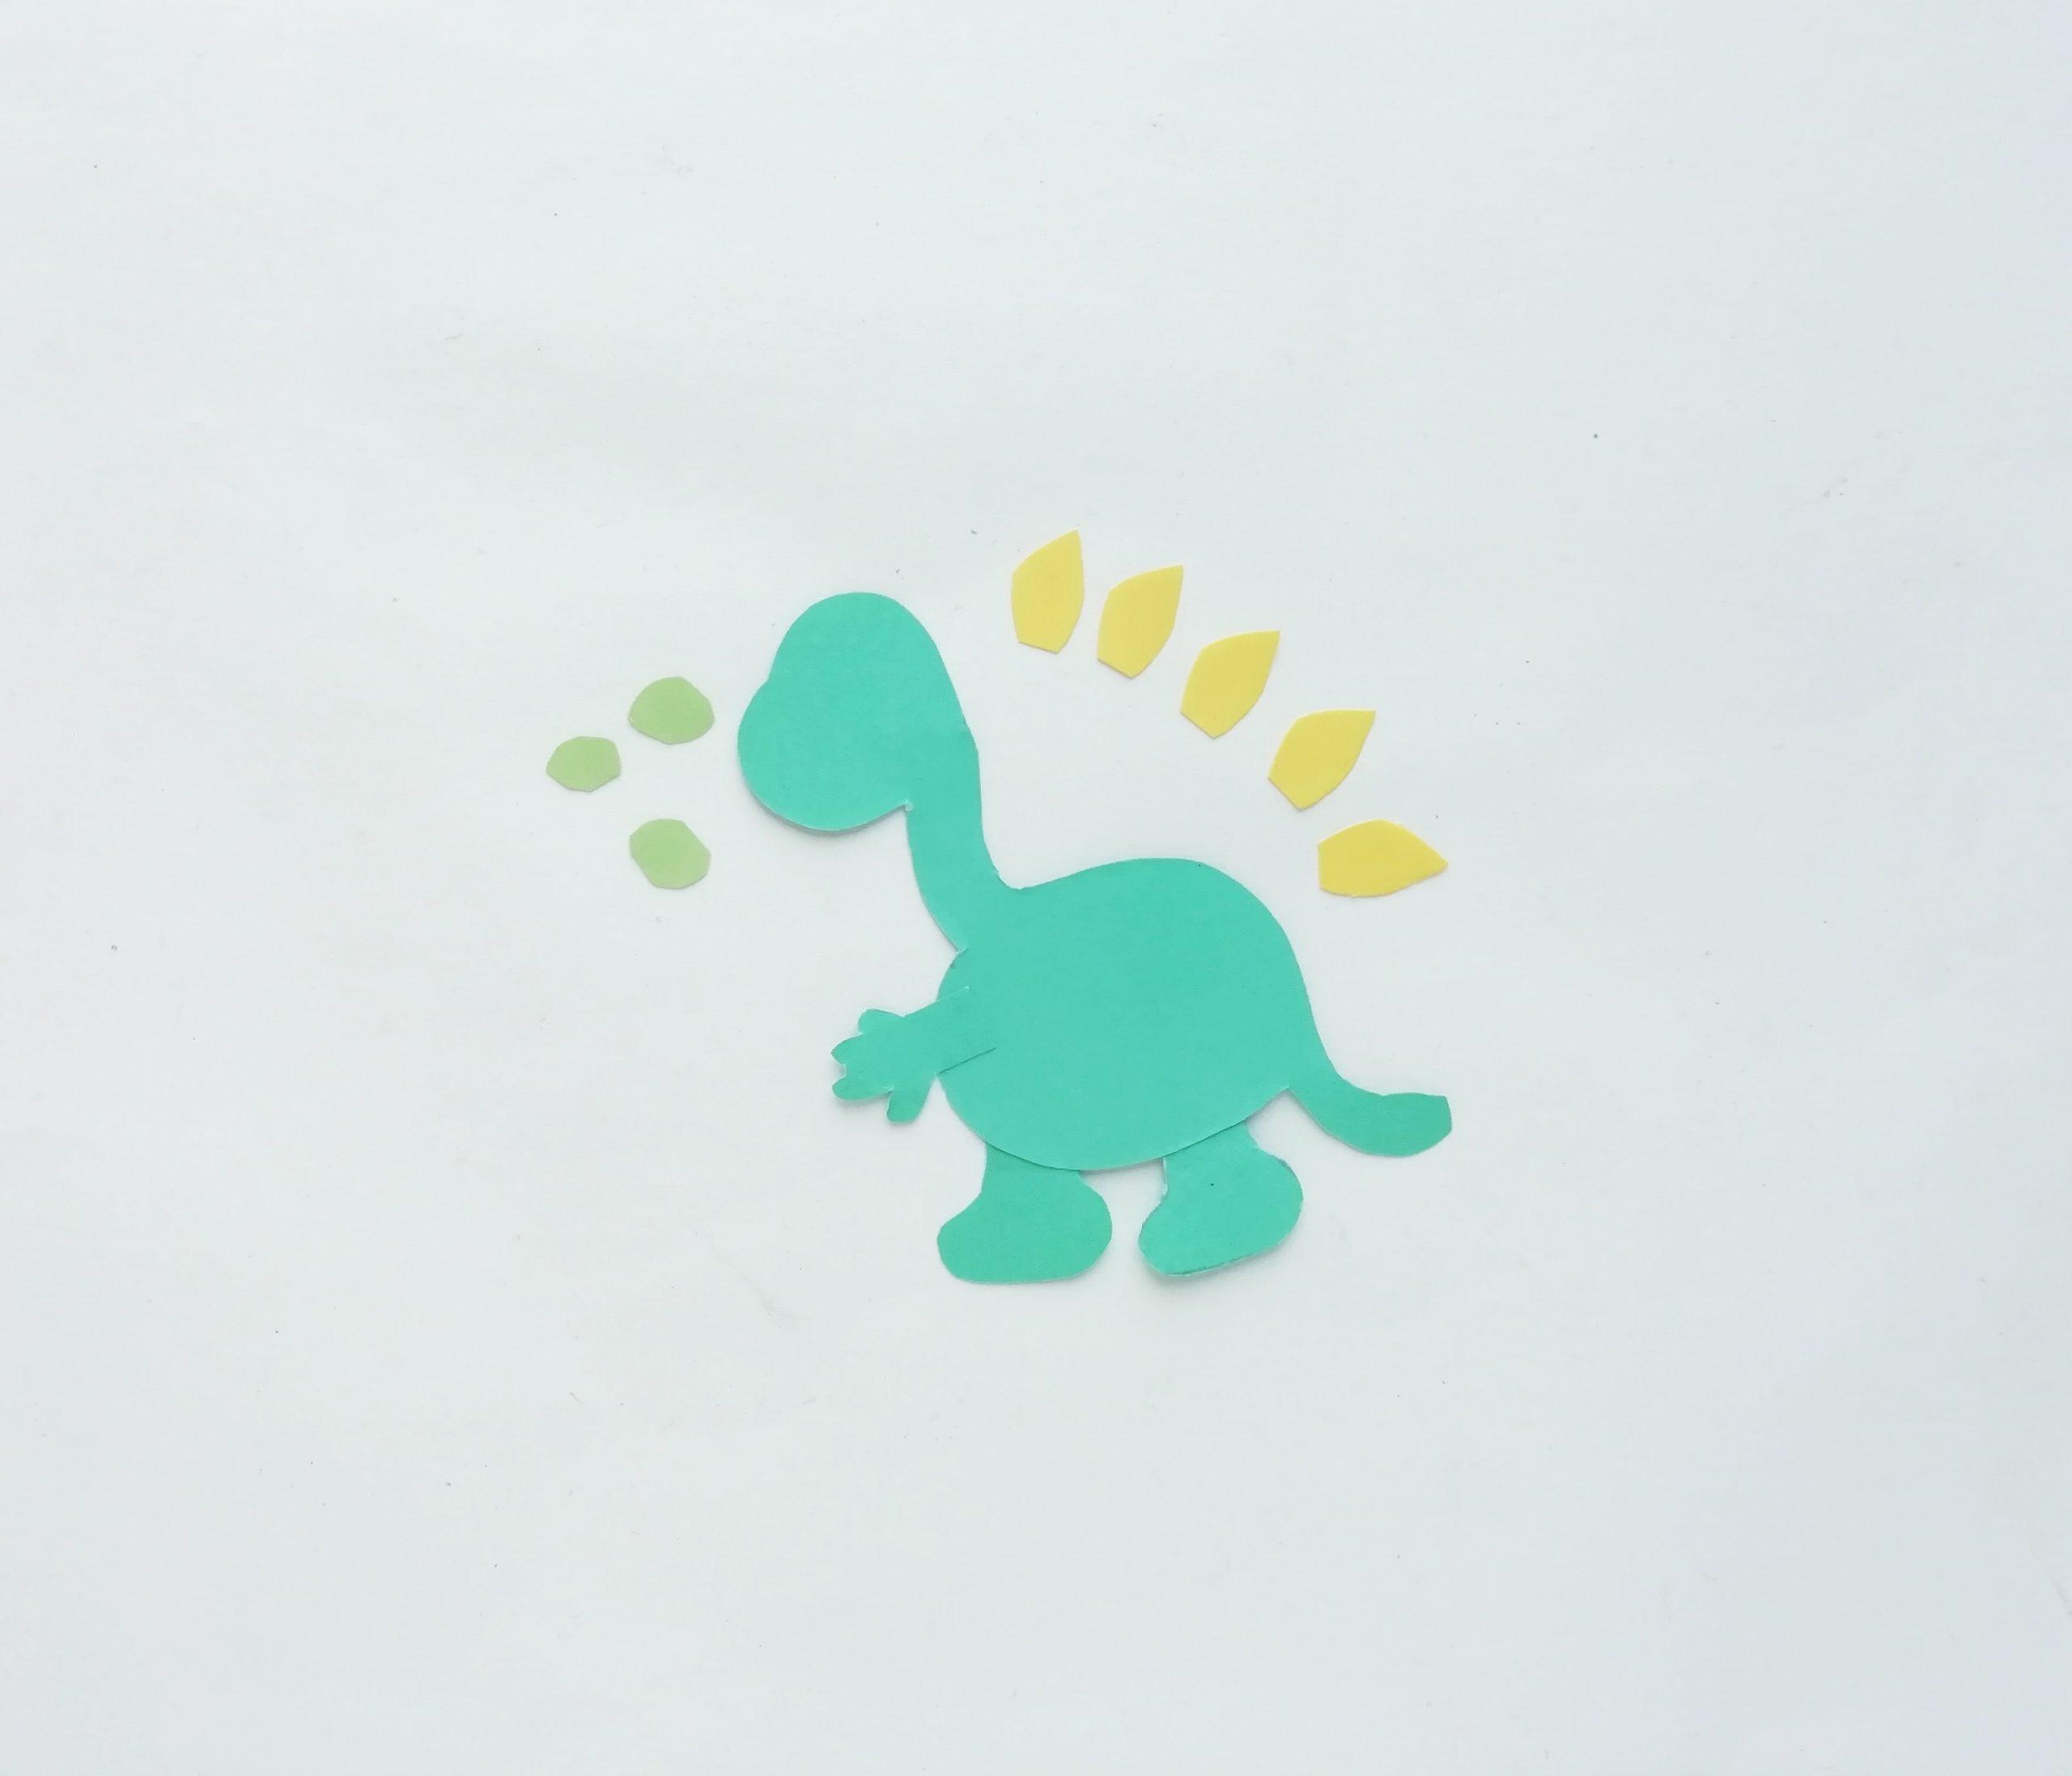 dinosaur pop up card step by step process